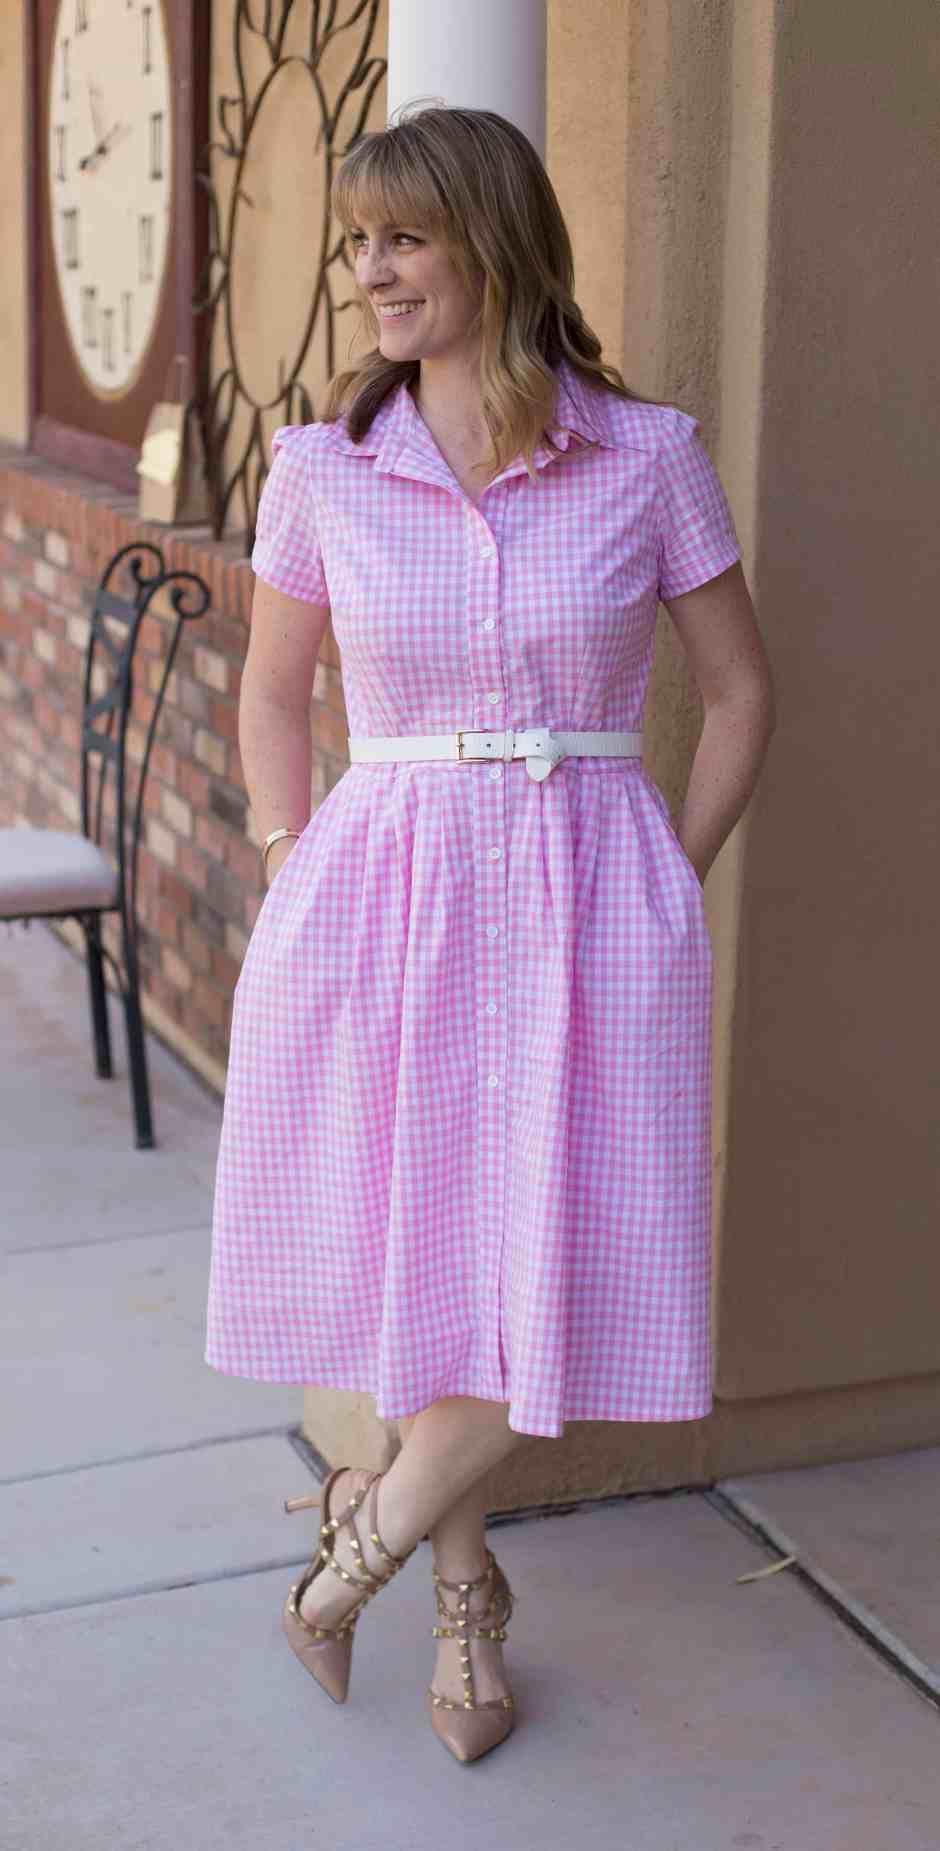 Customizable girls dress sewing pattern beginnerfriendly